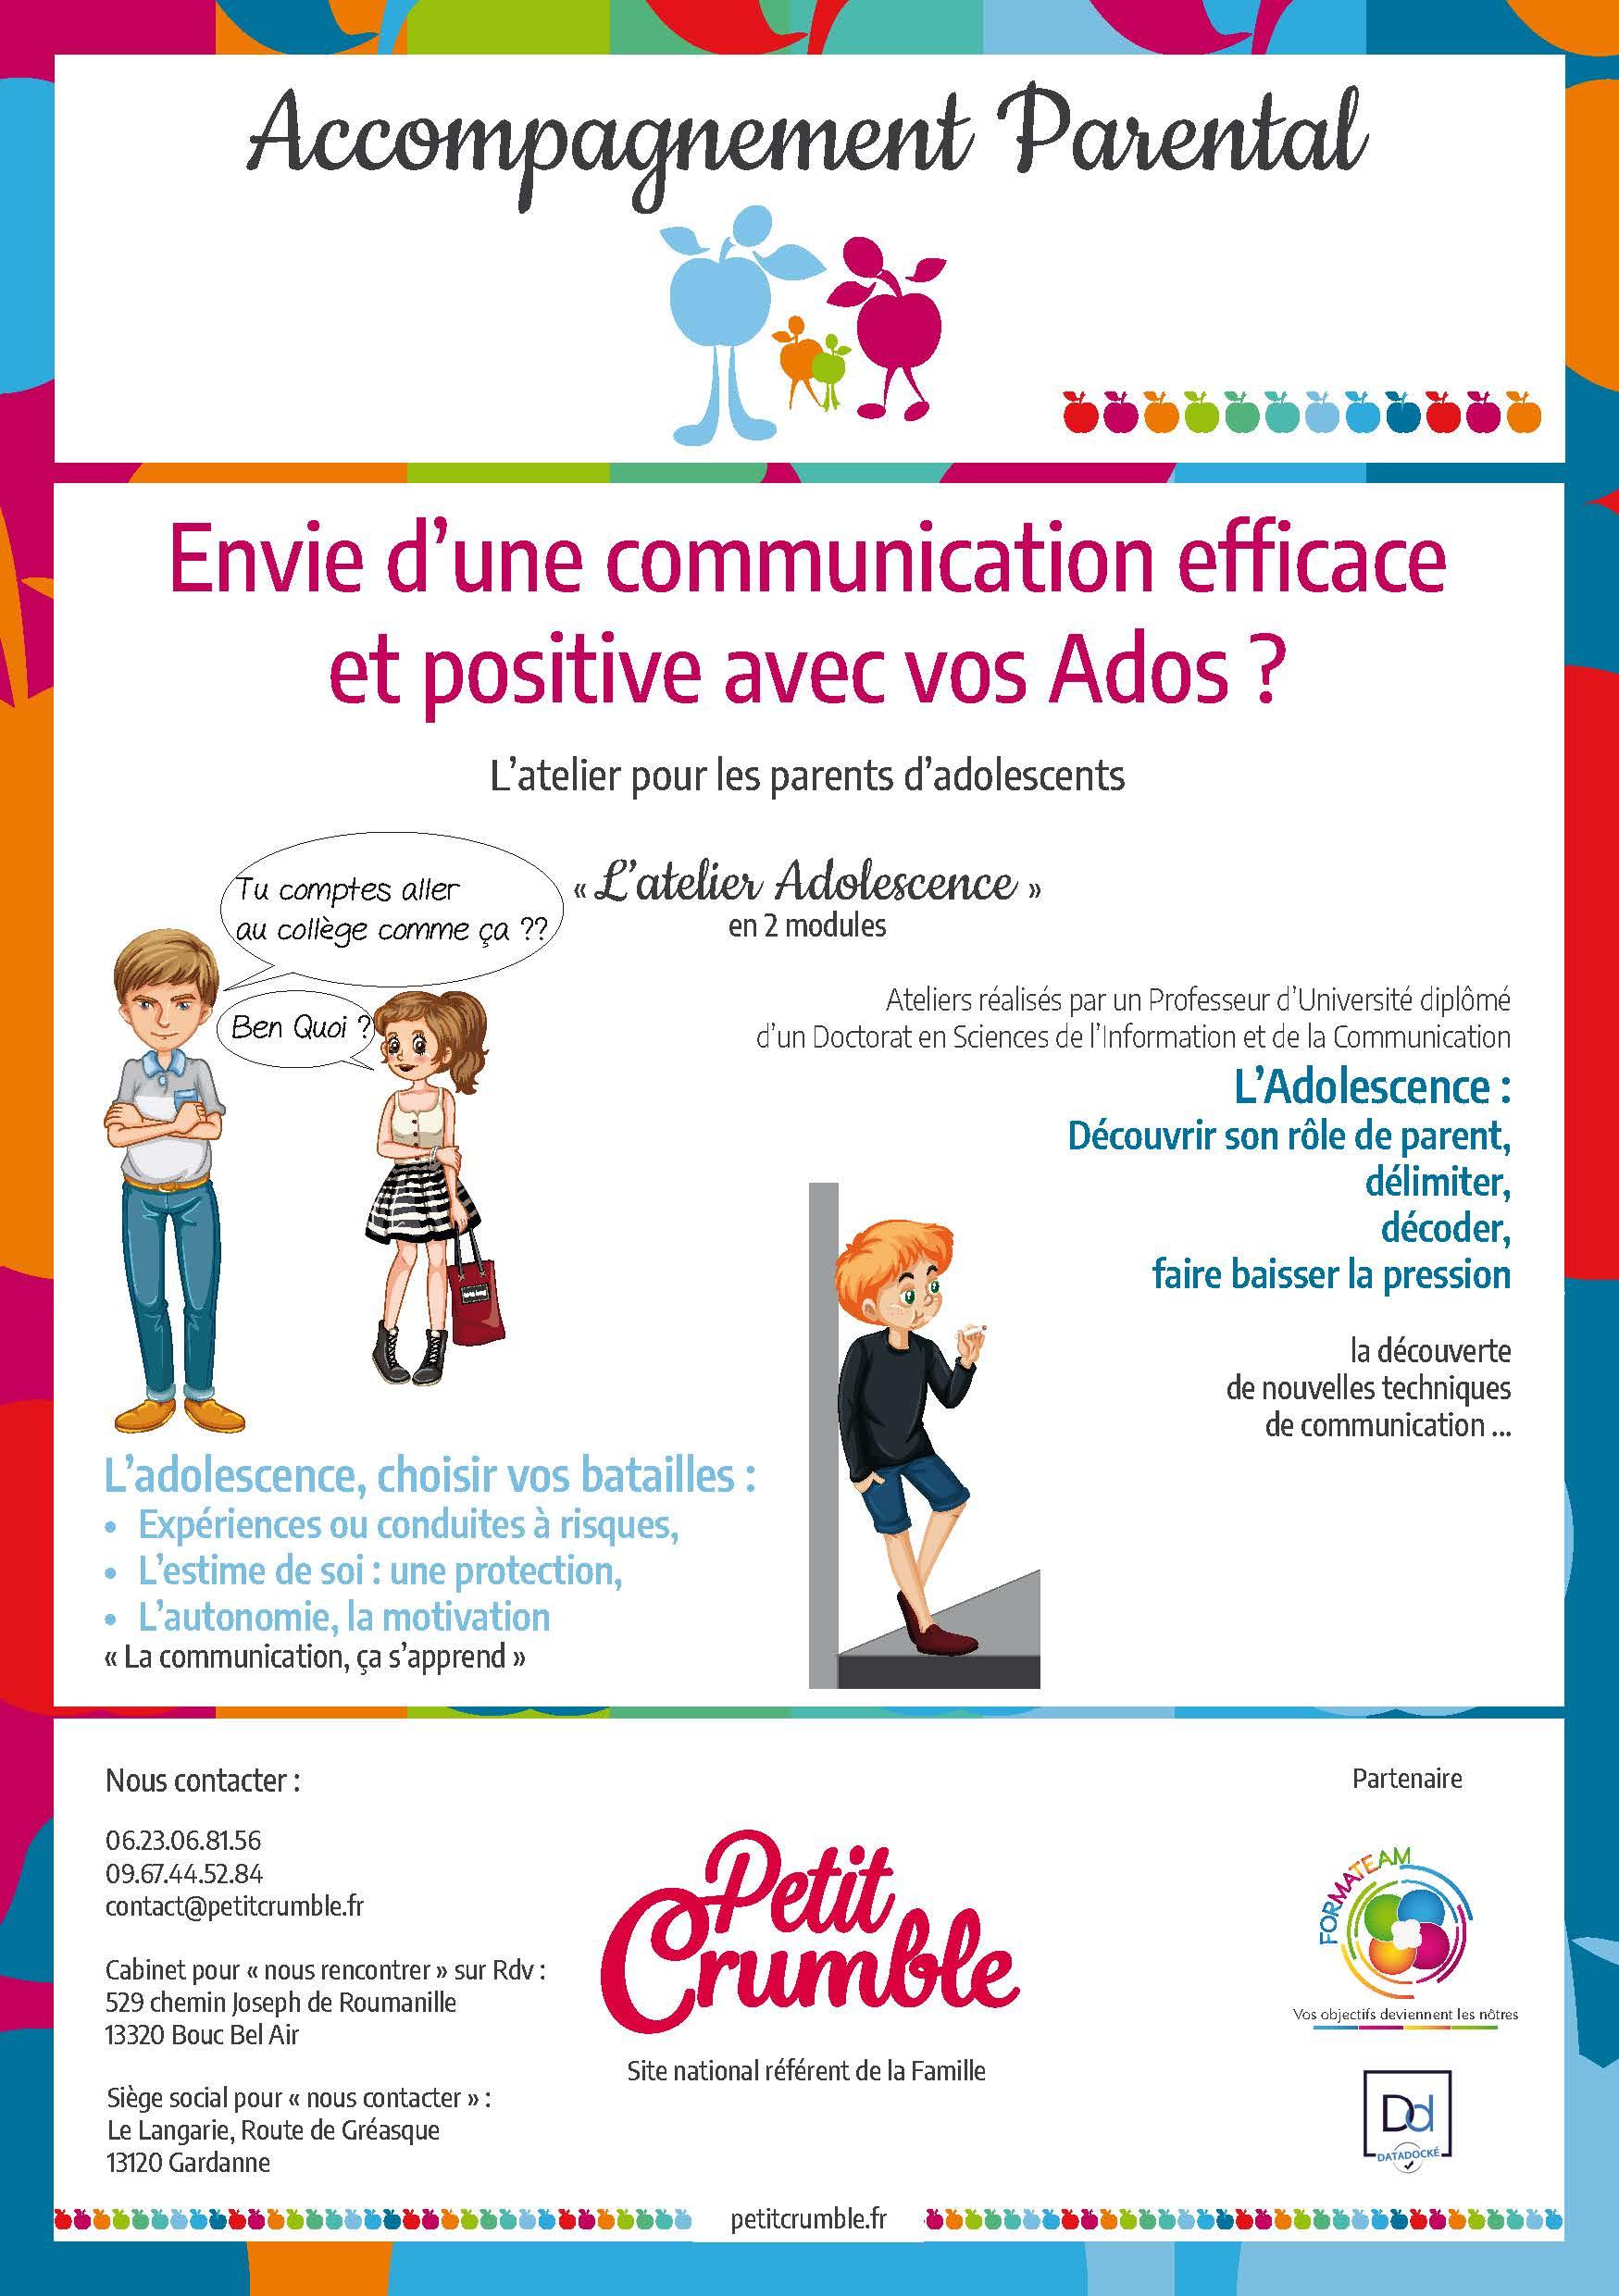 ACCOMPAGNEMENT-PARENTAL-ADOS-1-min